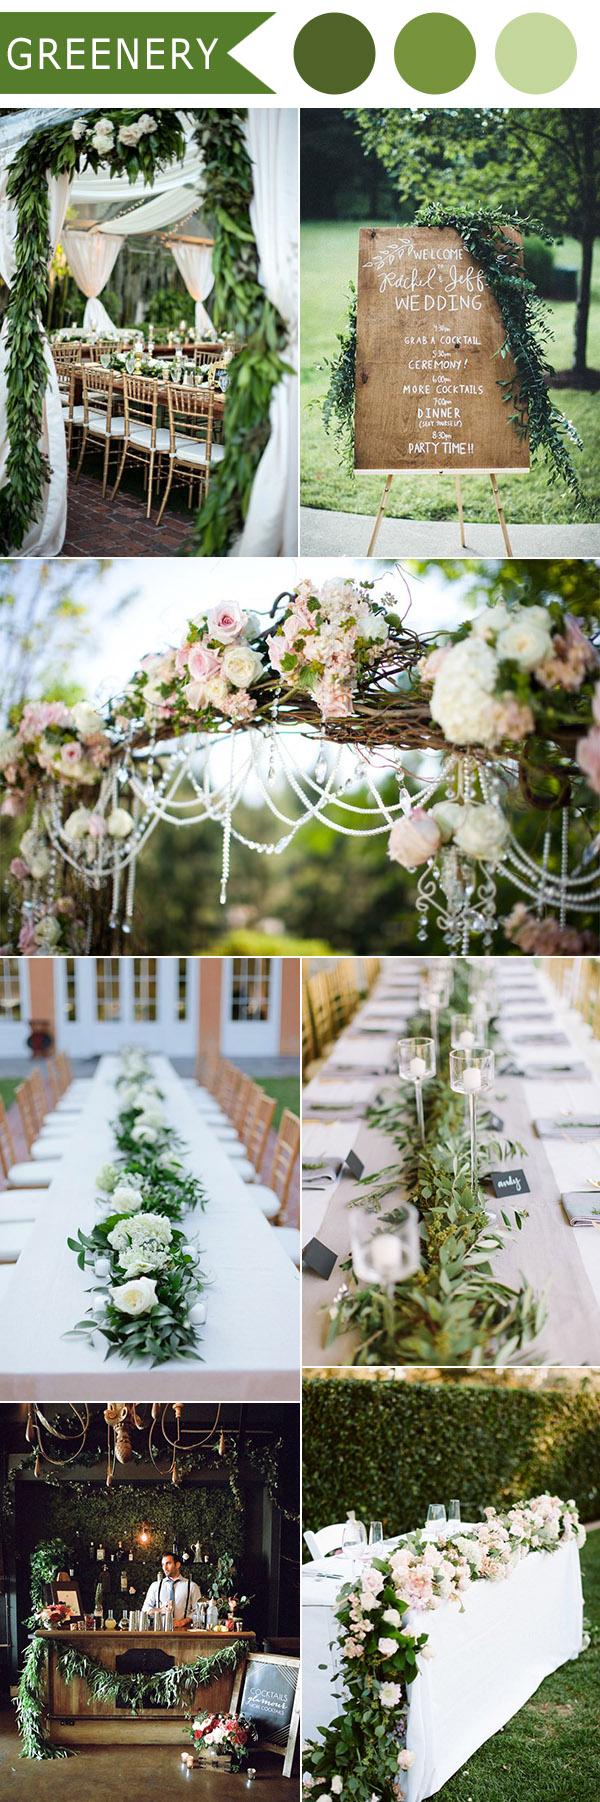 trending-greenery-natural-lush-wedding-ideas